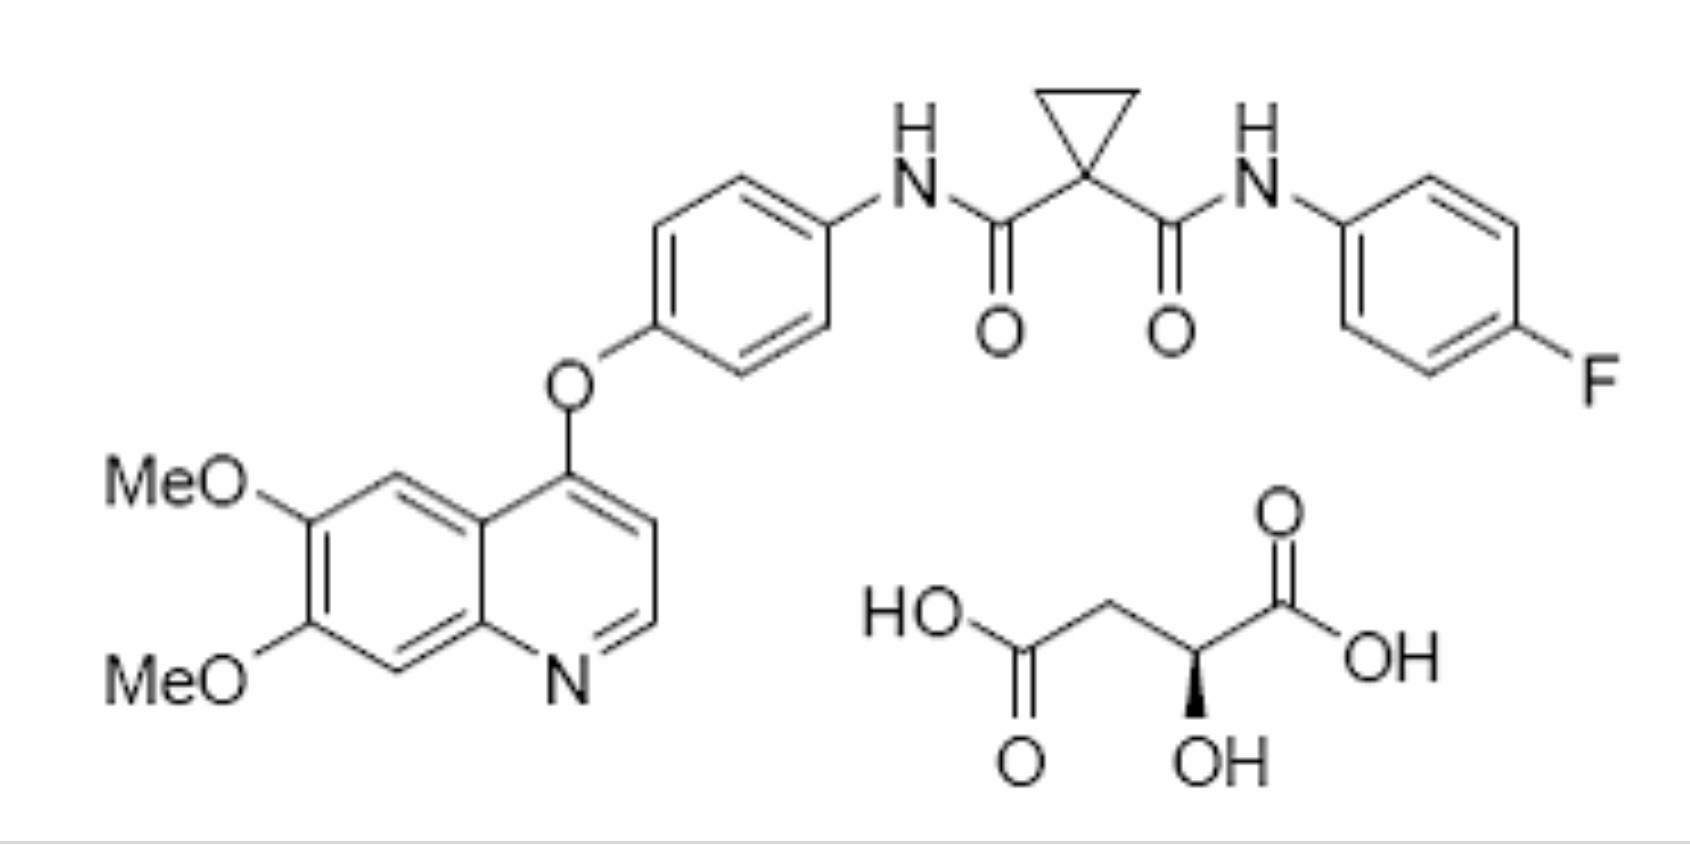 The chemistry of Cabozantinib